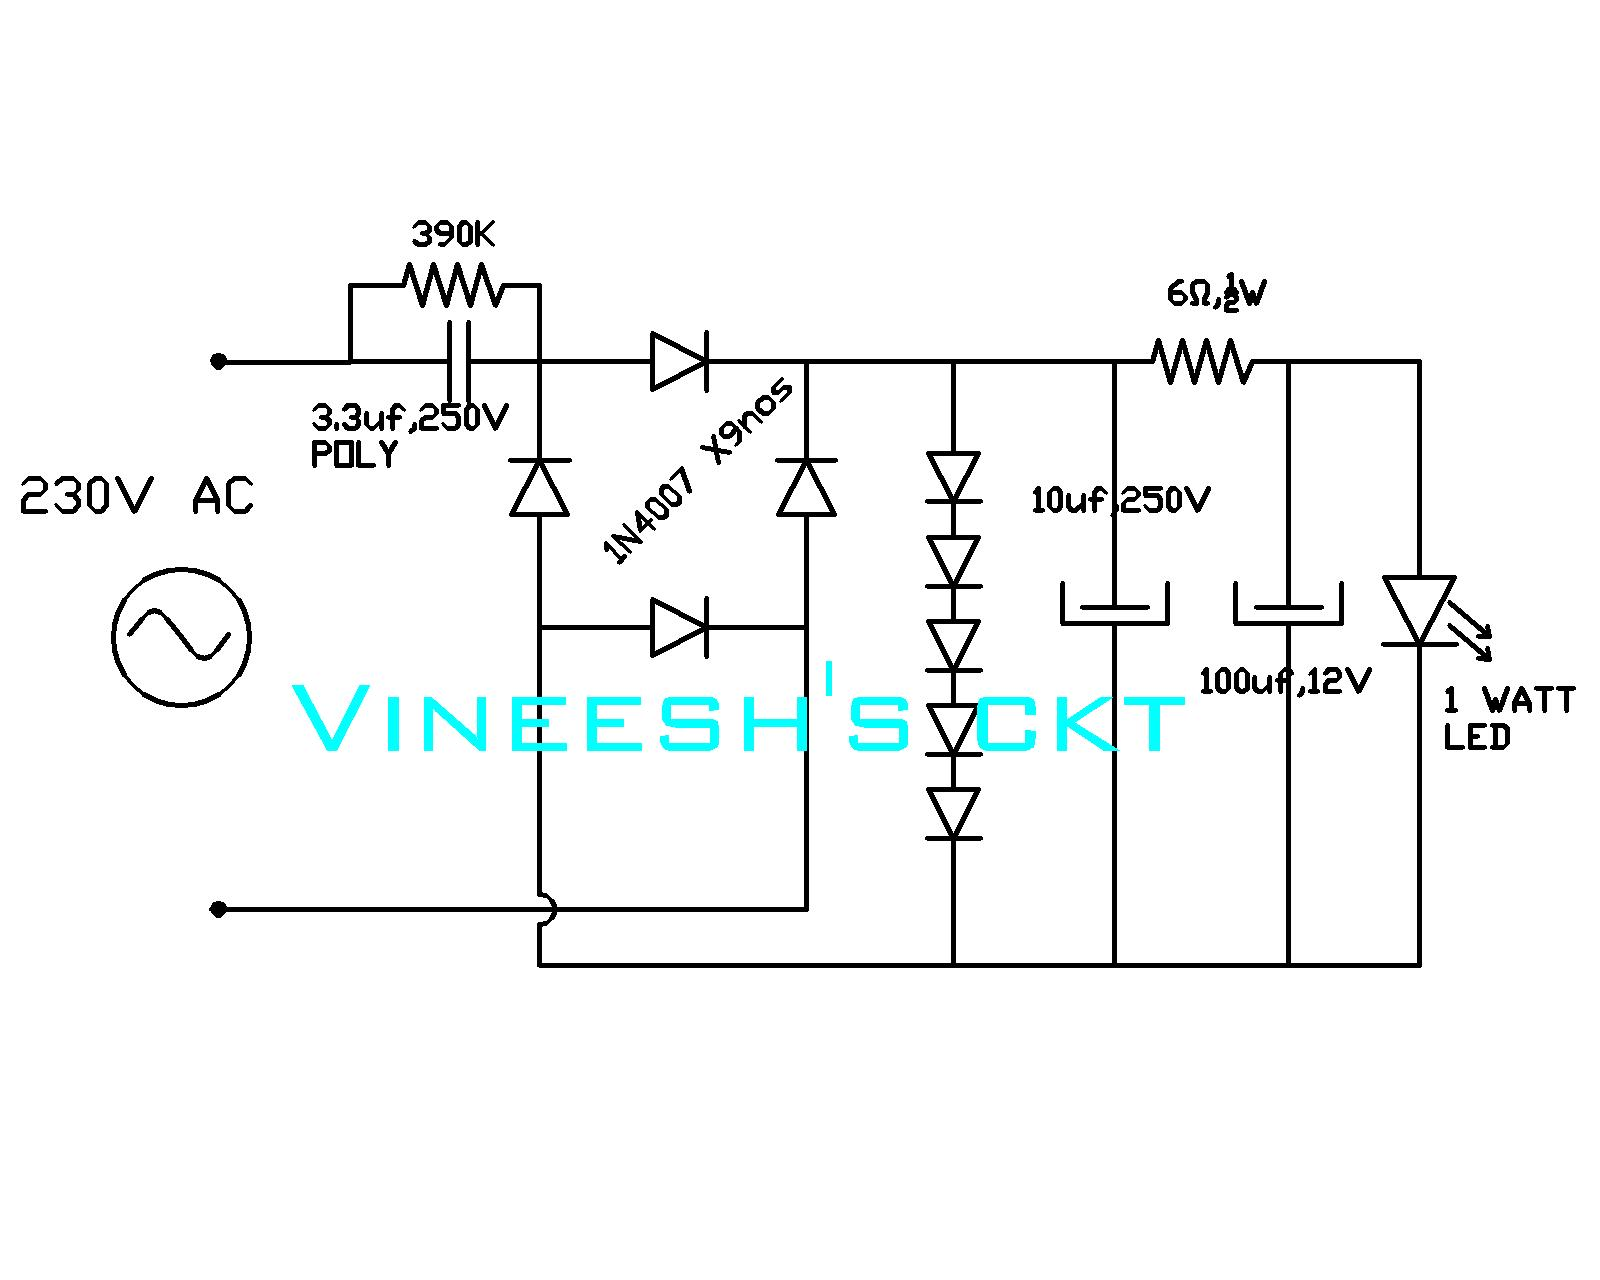 10 watt led driver circuit diagram micro usb plug wiring simple circuits vineetron 230v to 1